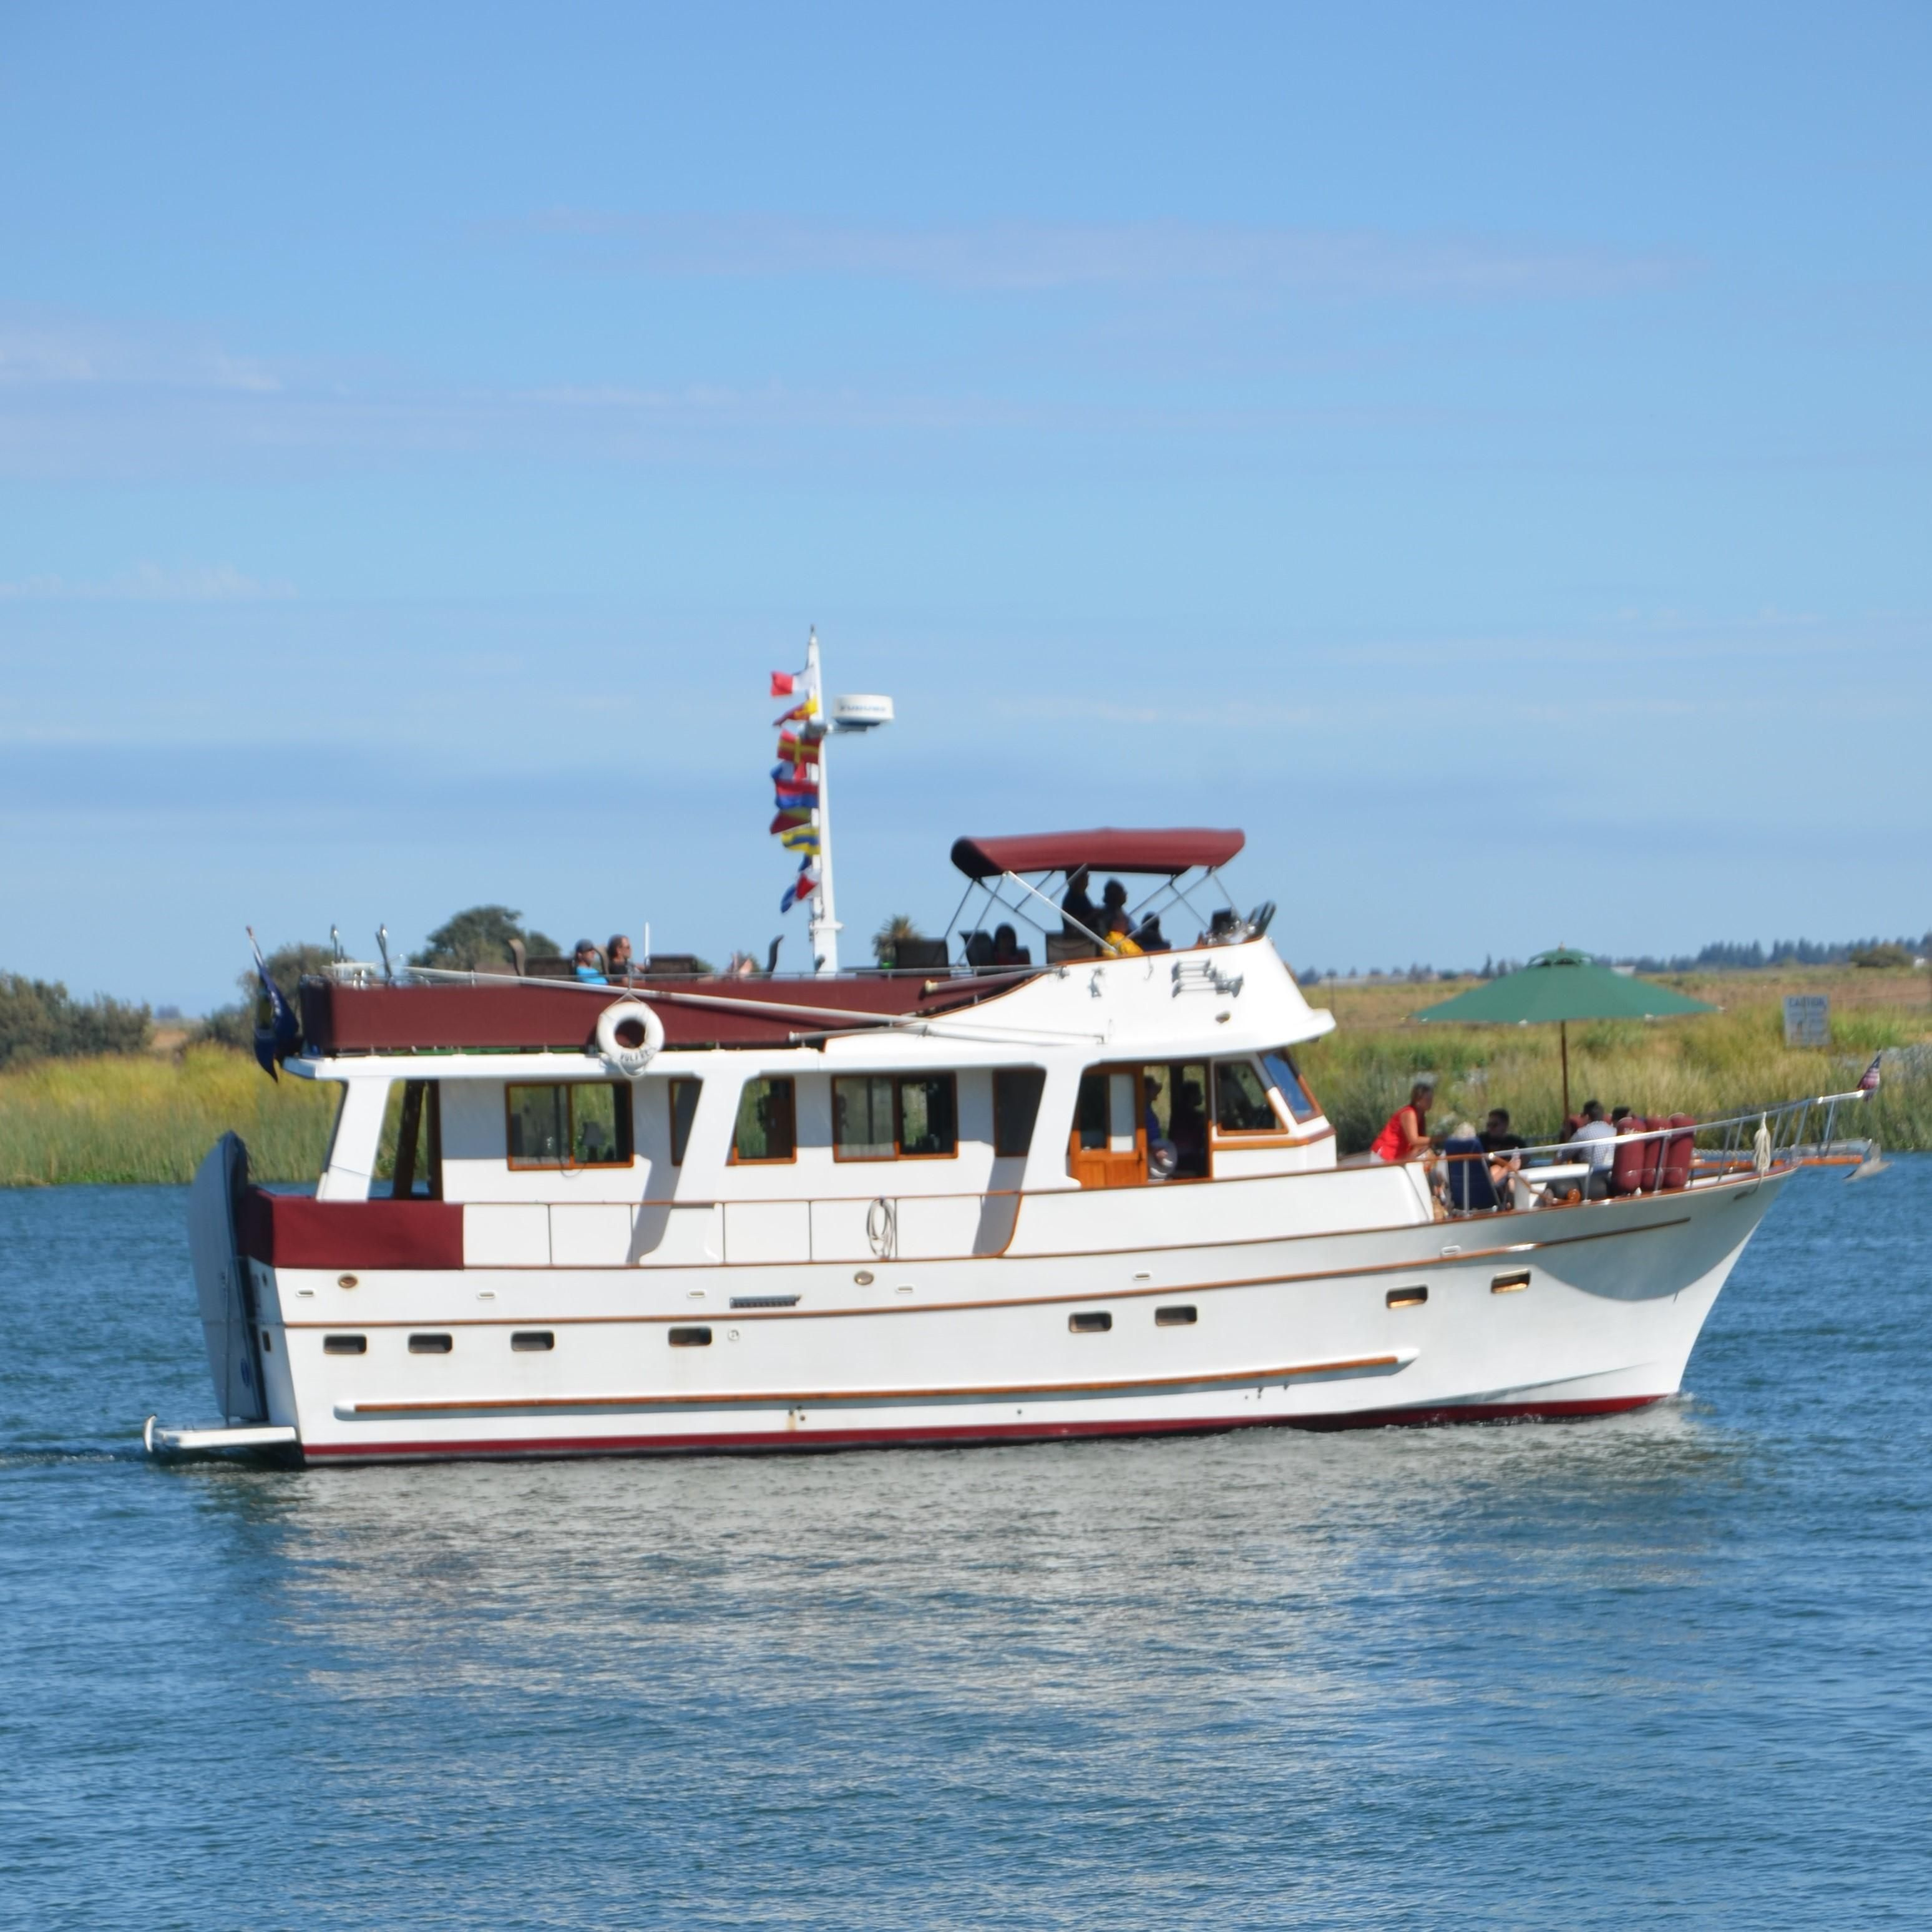 Northern Illinois Marine Dealer: 1981 Marine Trader 50 Trawler Power Boat For Sale